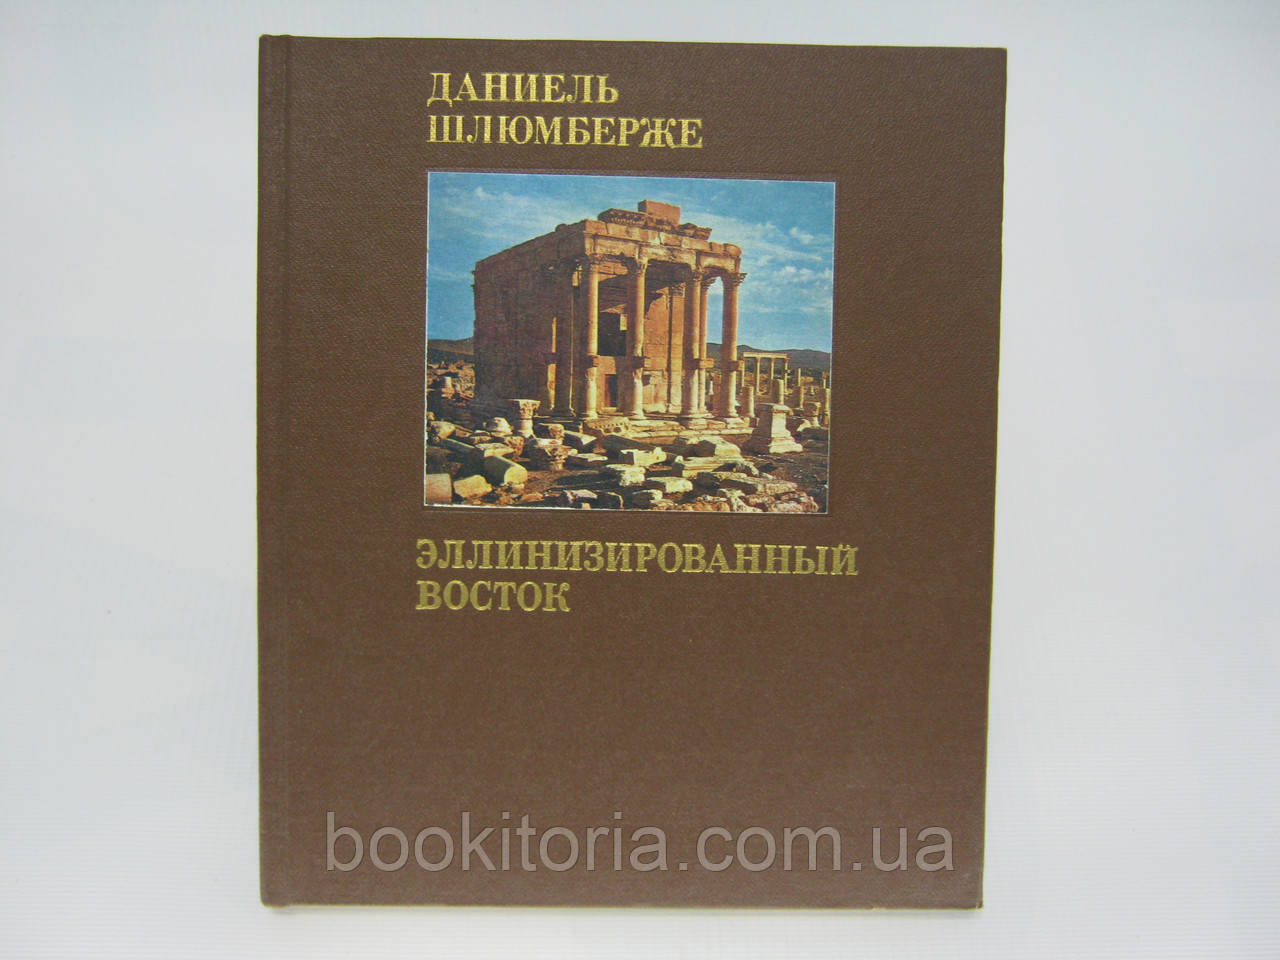 Шлюмберже Д. Эллинизированный Восток (б/у).